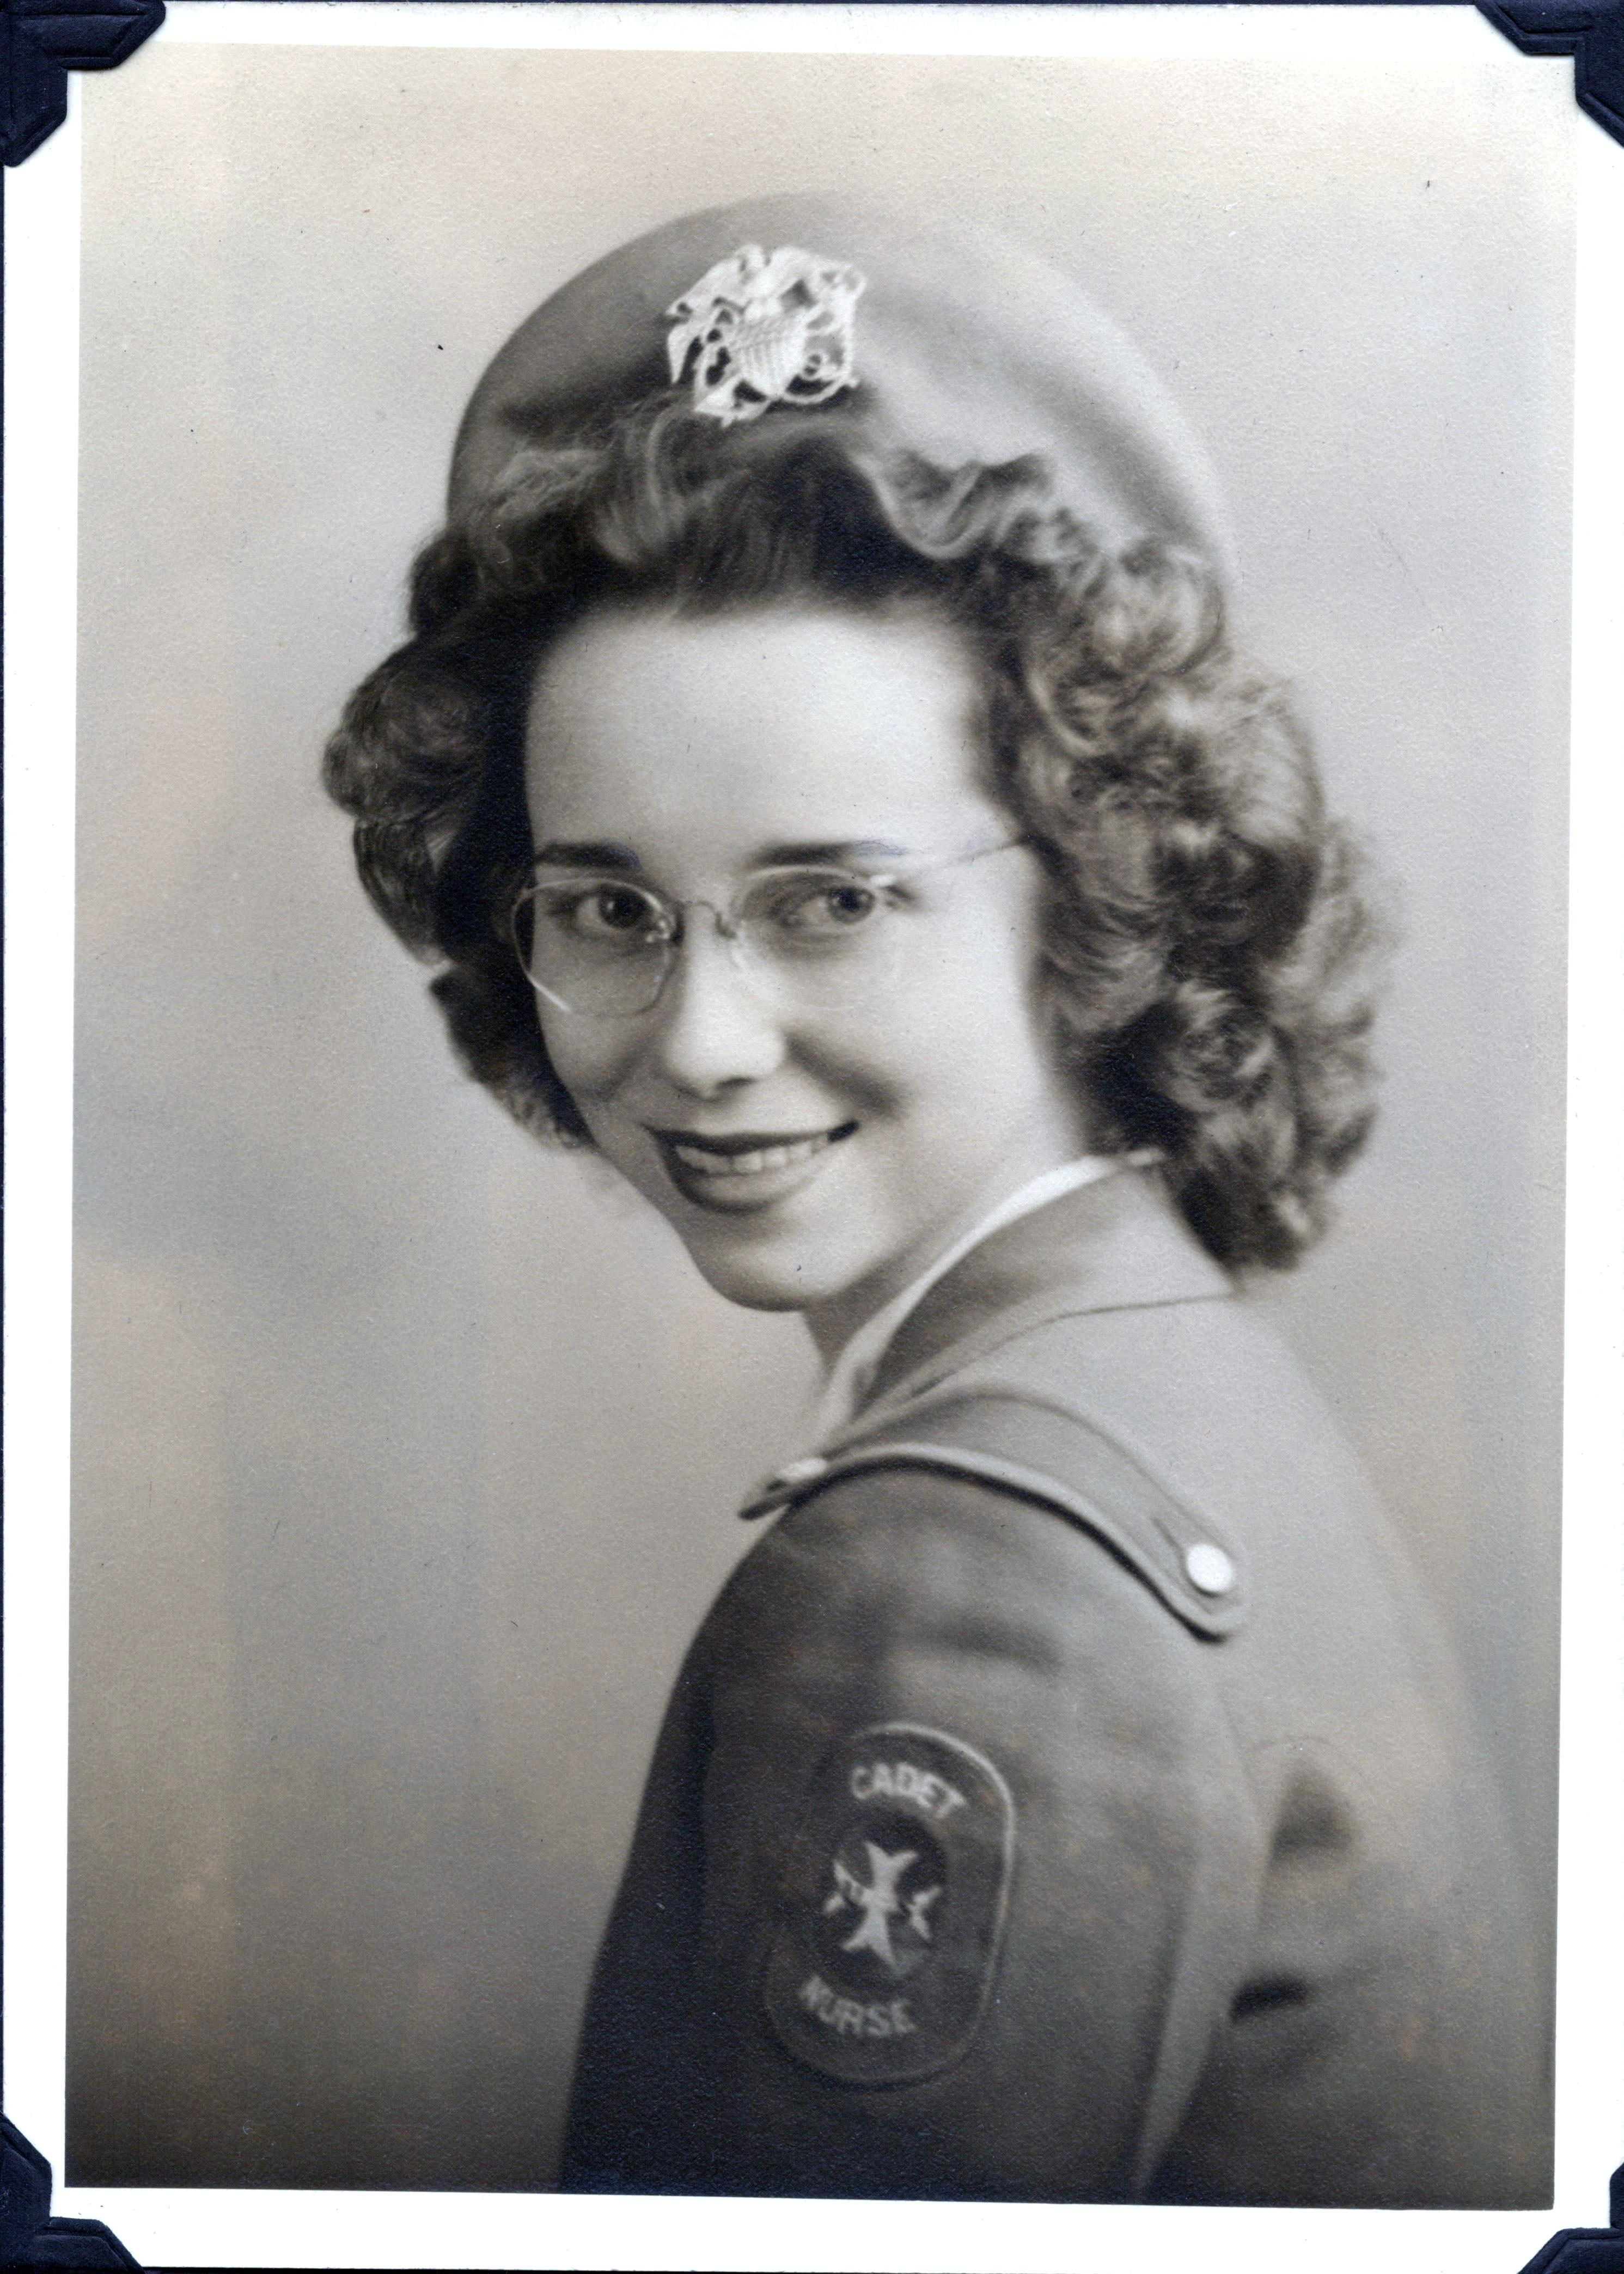 Cadet Nurse Emerson